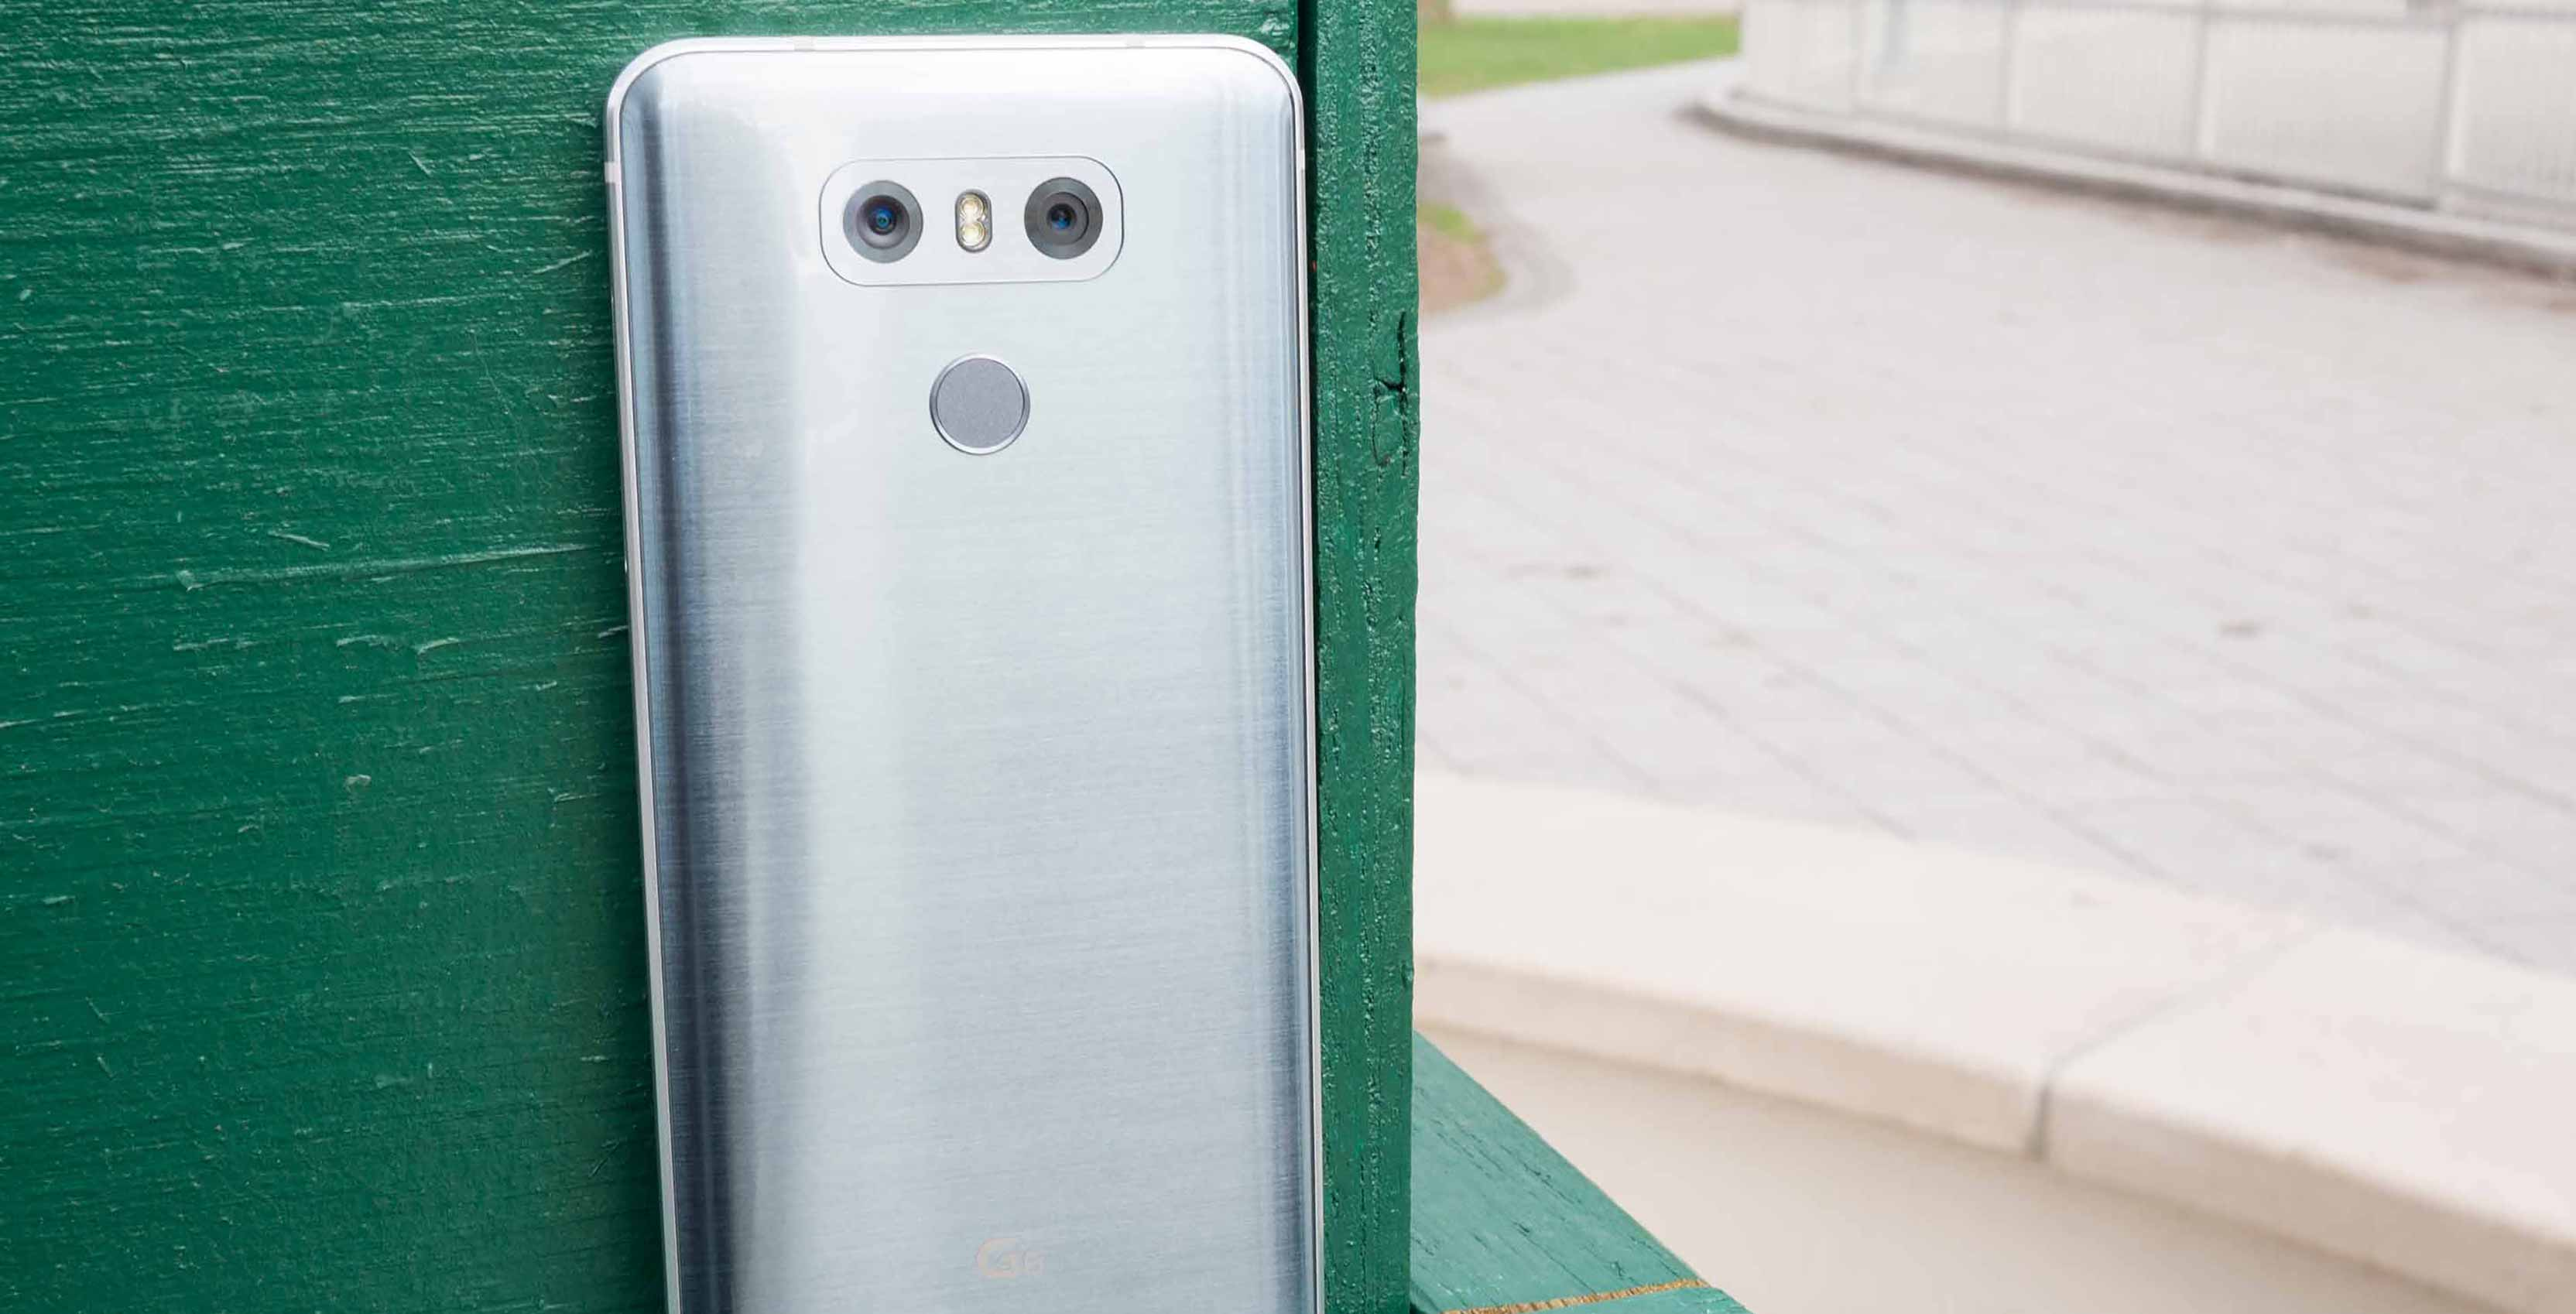 LG G6 against wall